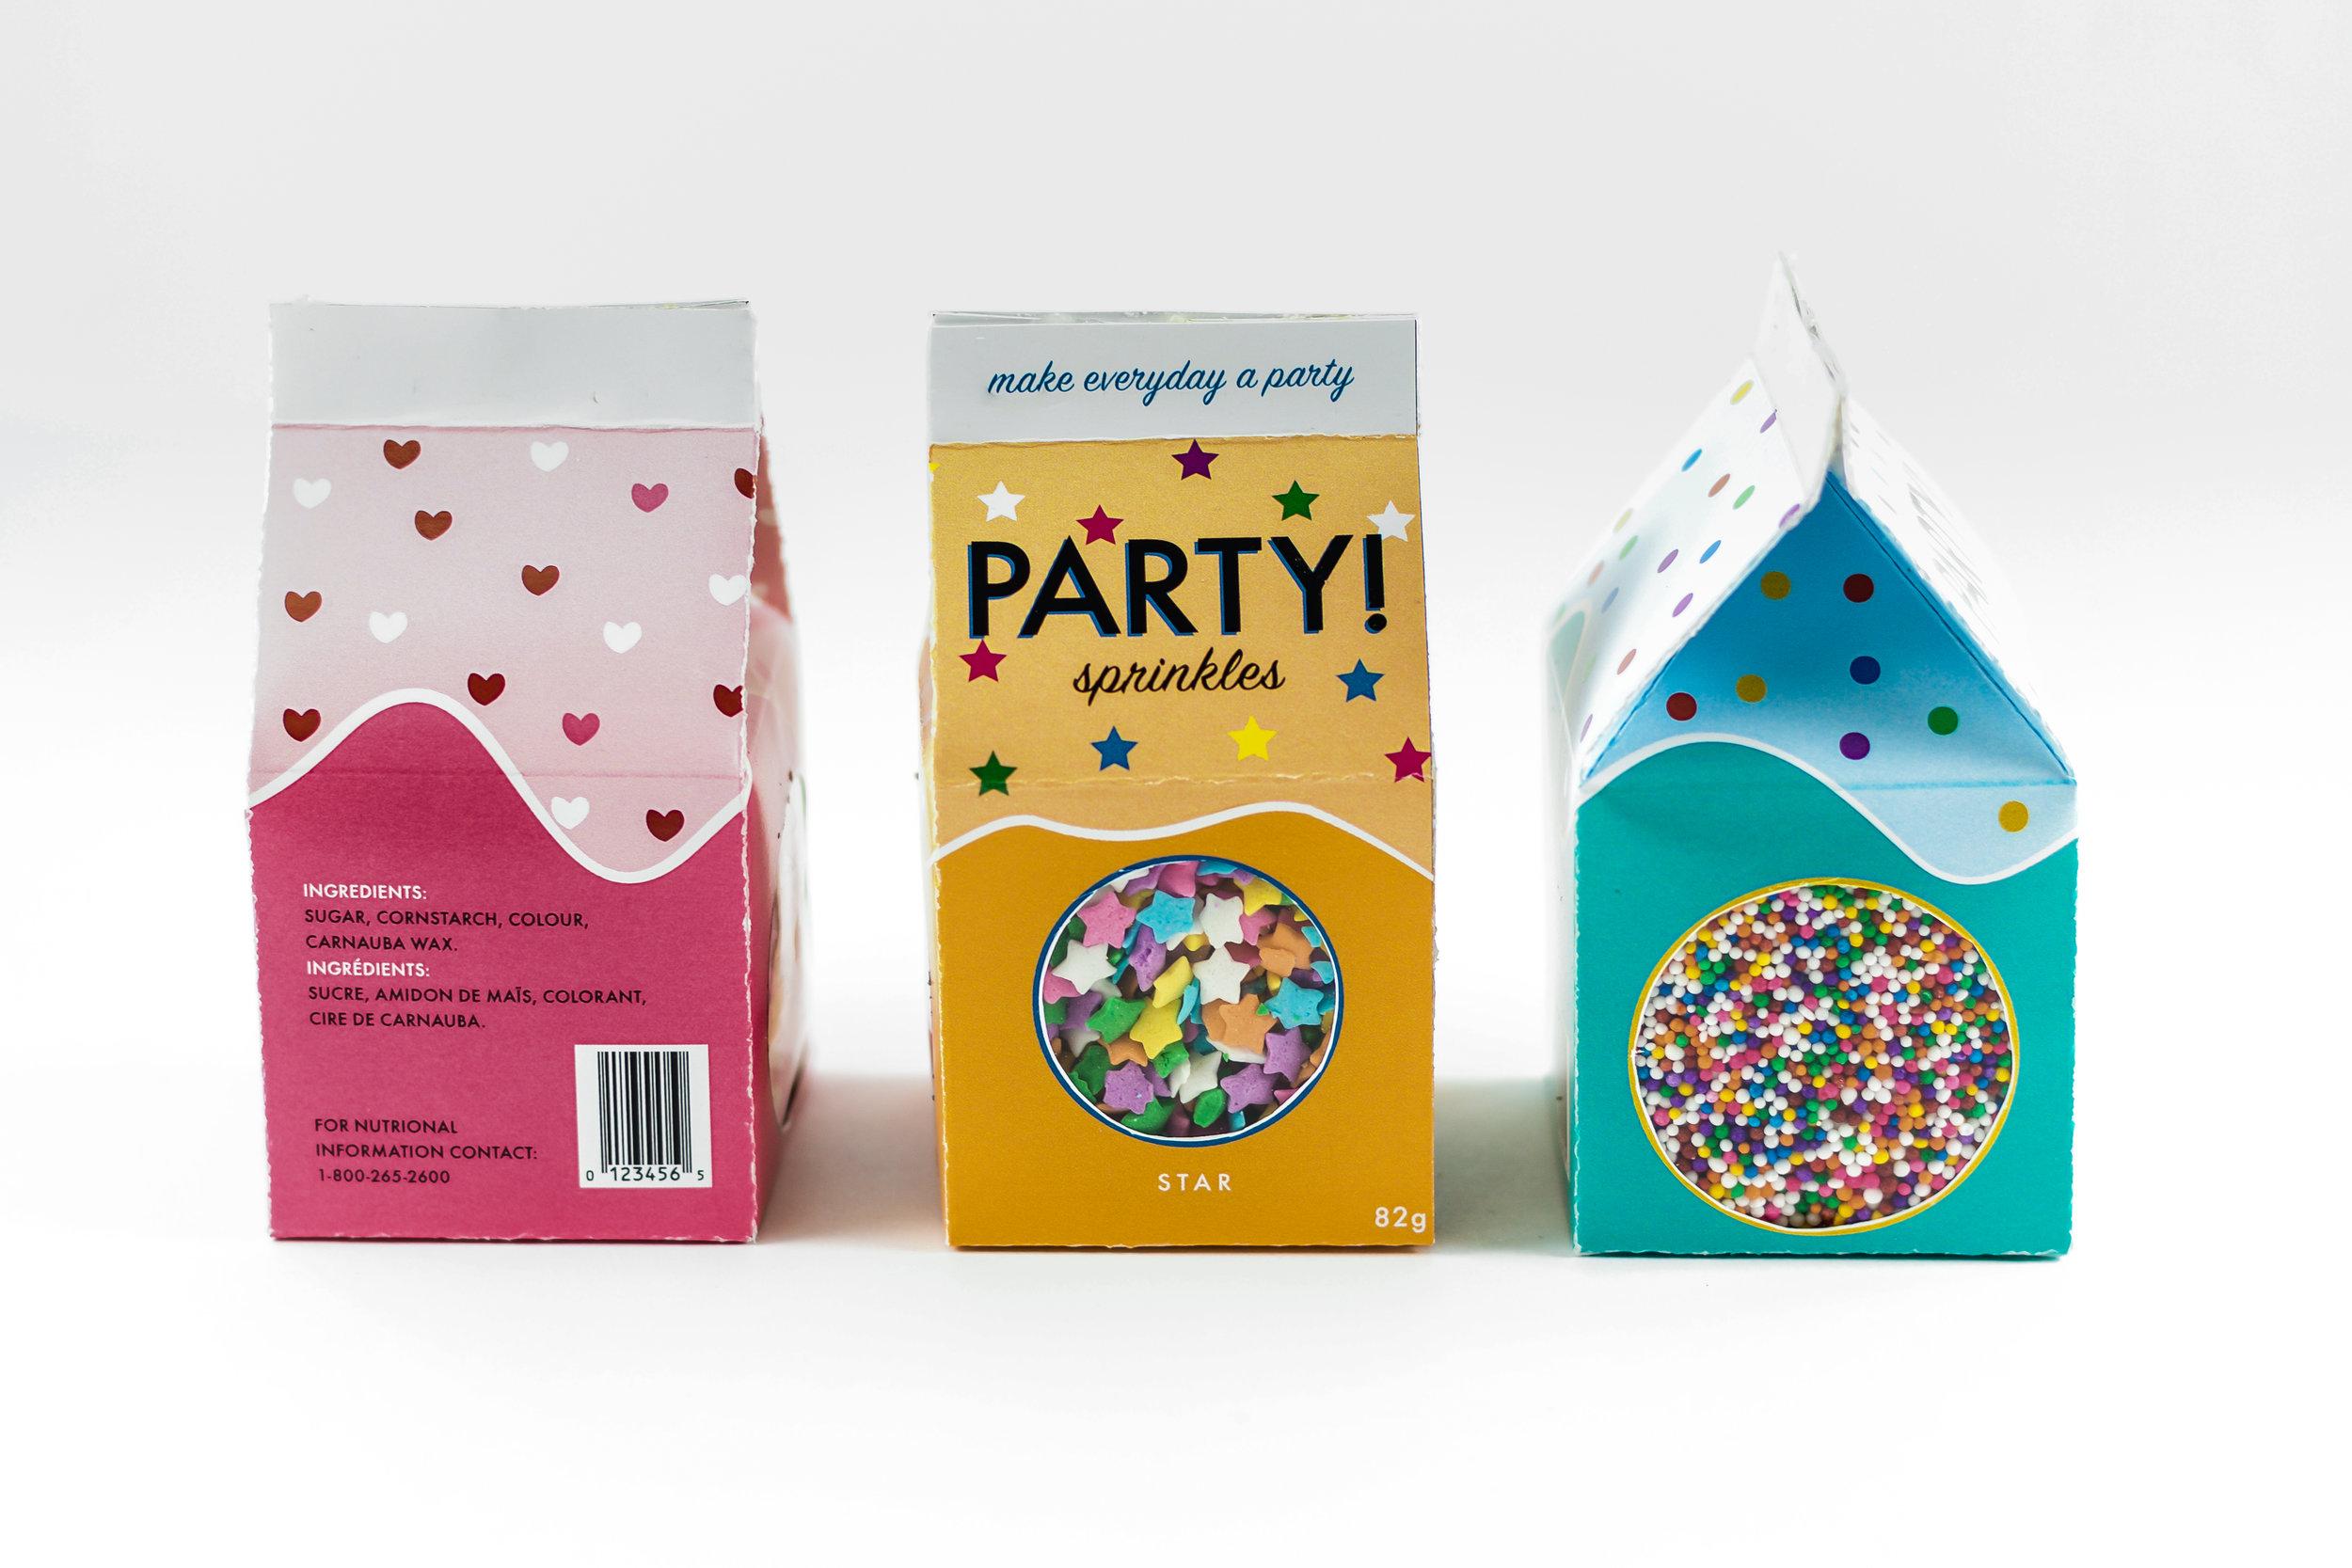 PARTY! Sprinkle Package Design Series